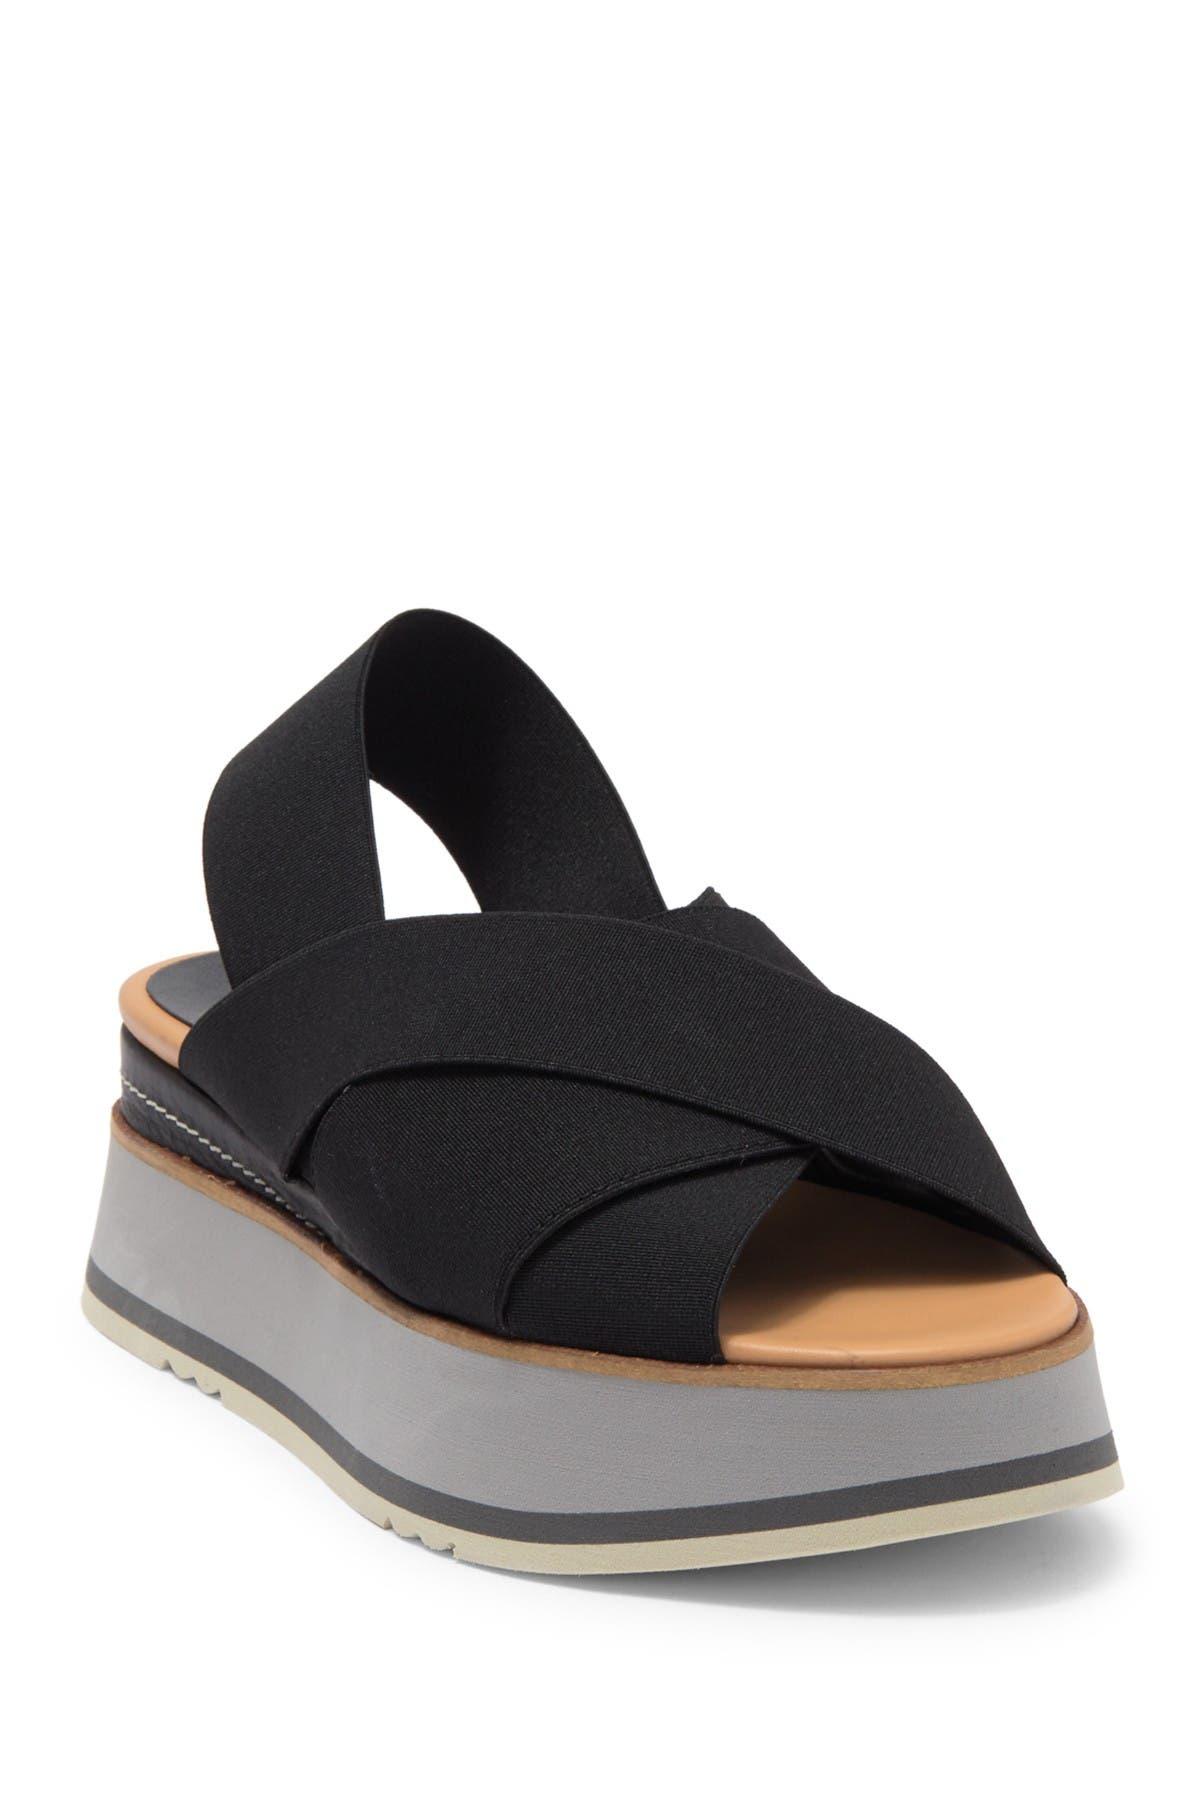 Image of Paloma Barcelo Tobago Platform Sandal